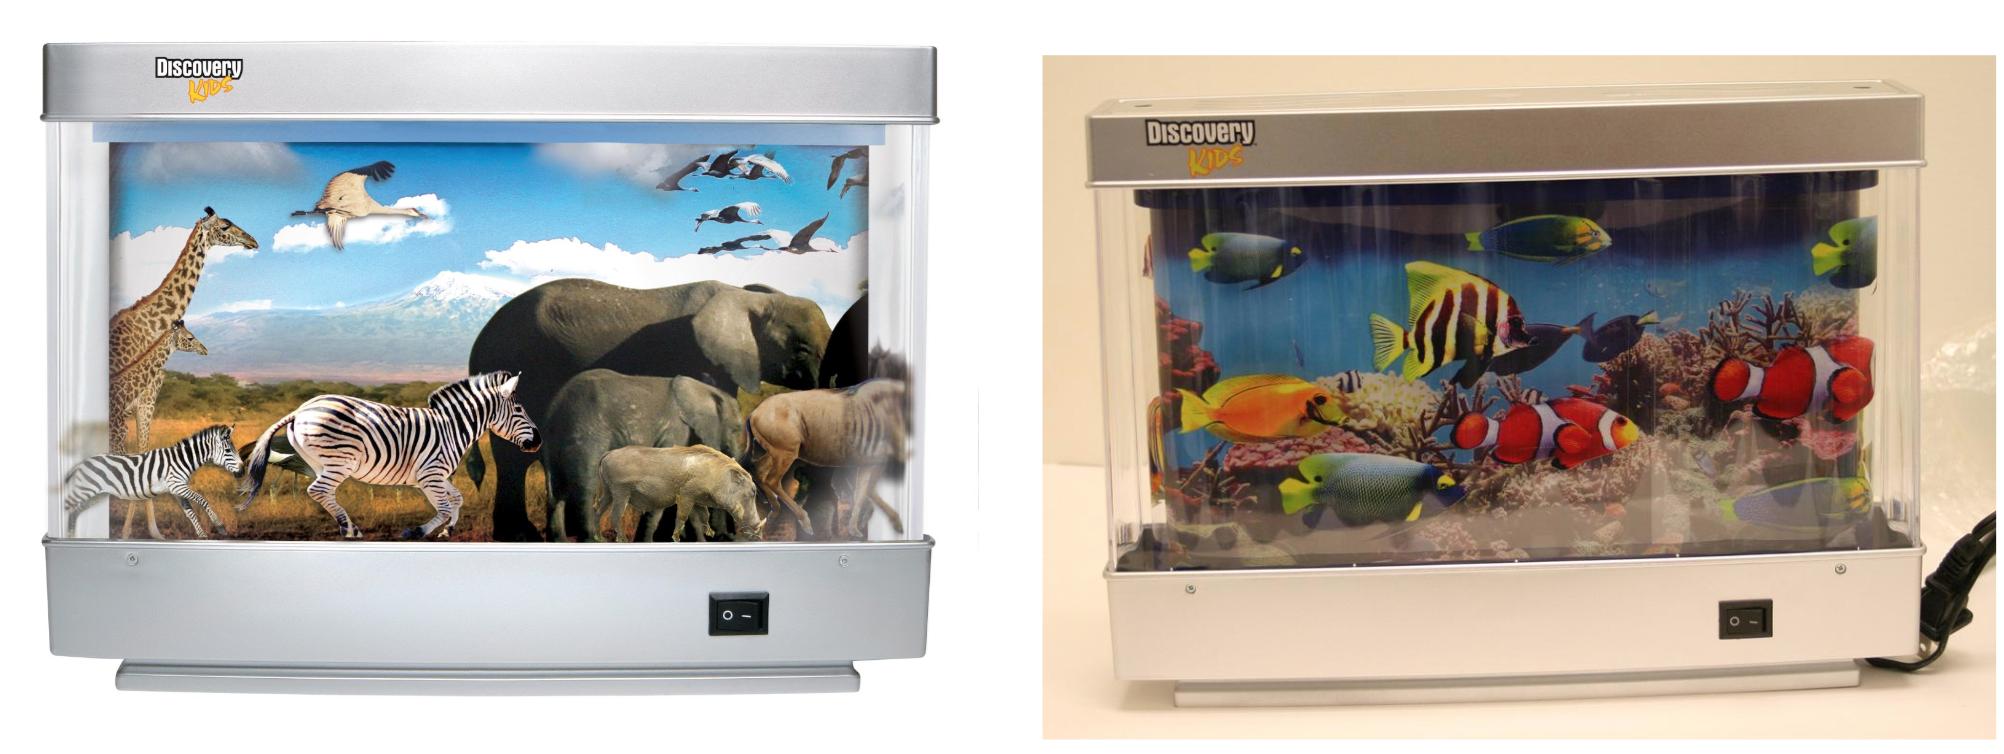 Innovage Discovery Kids™ Animated Marine and Safari Lamps